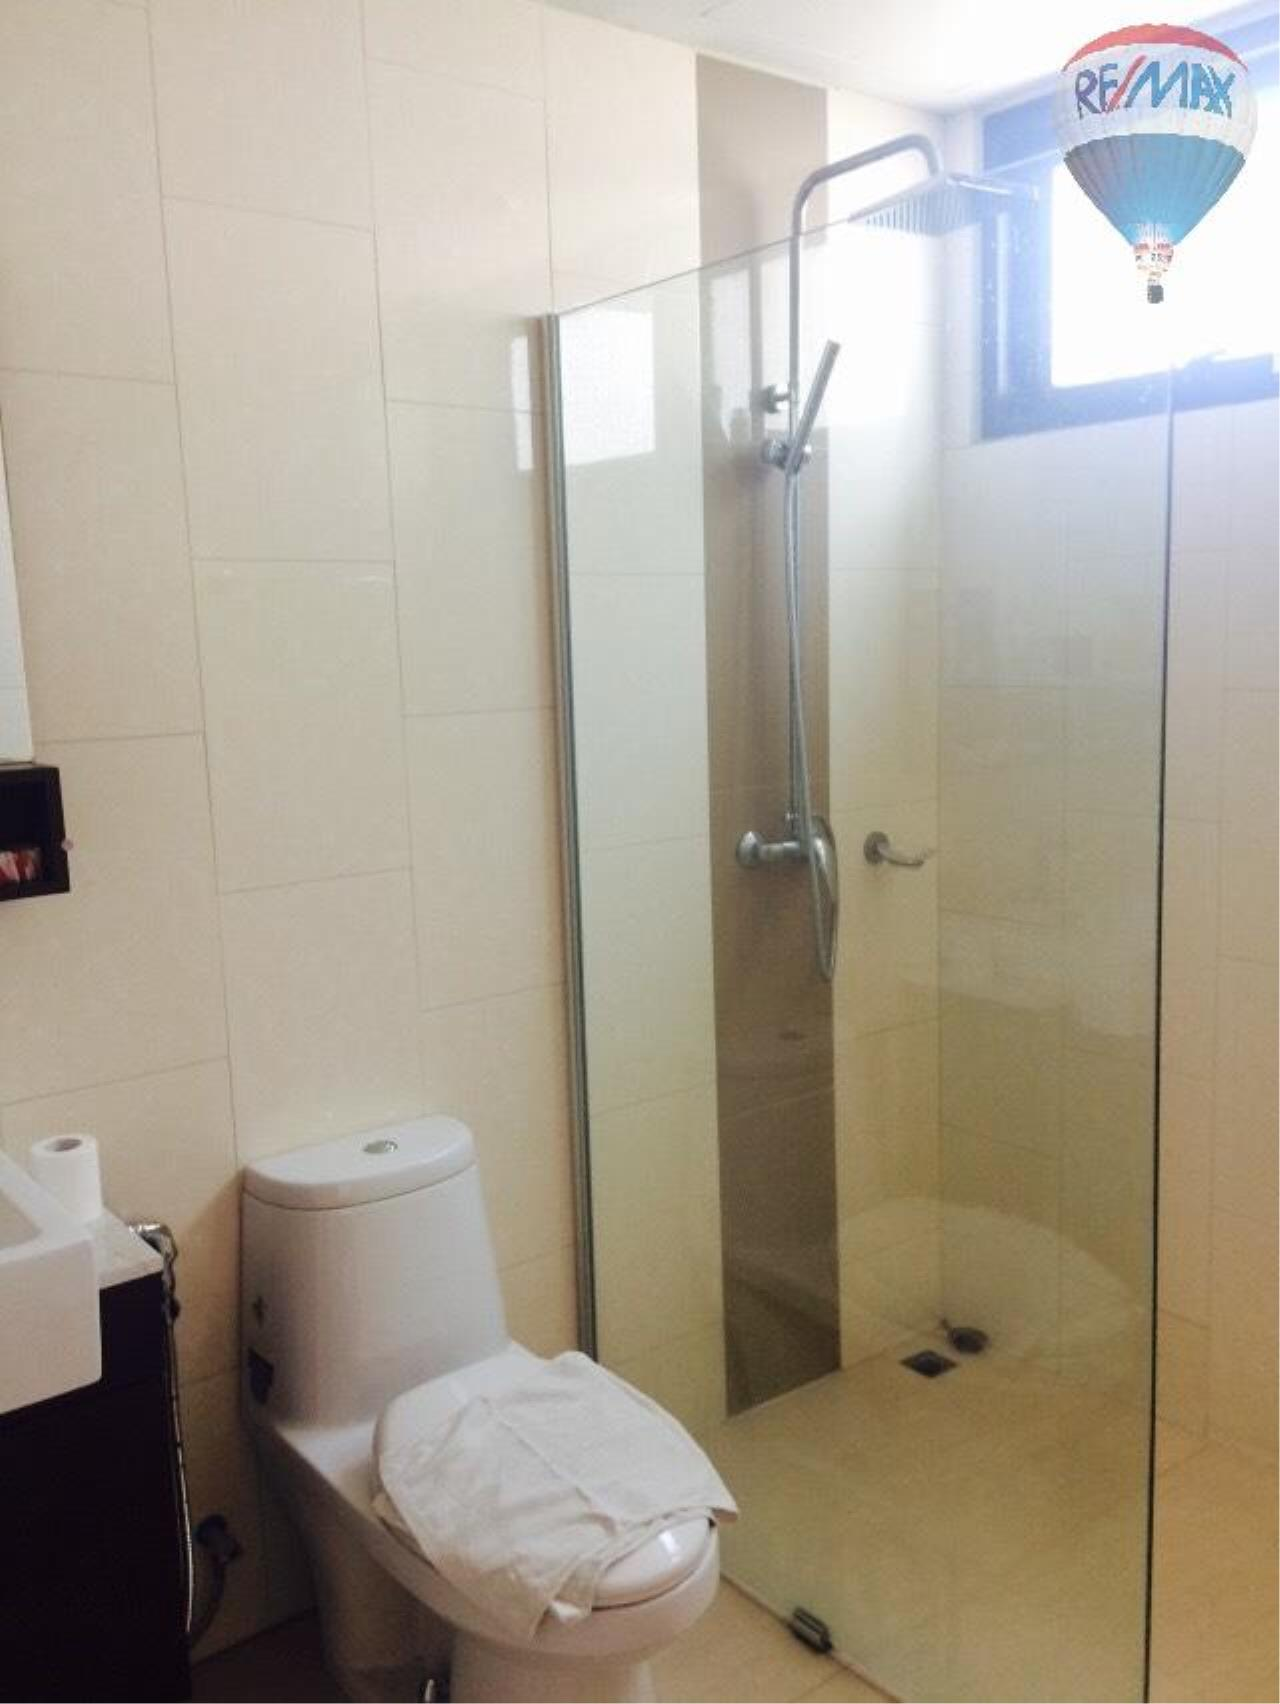 RE/MAX Properties Agency's Condominium for rent 2 bedrooms 92 Sq.m. at Renova Residence 10